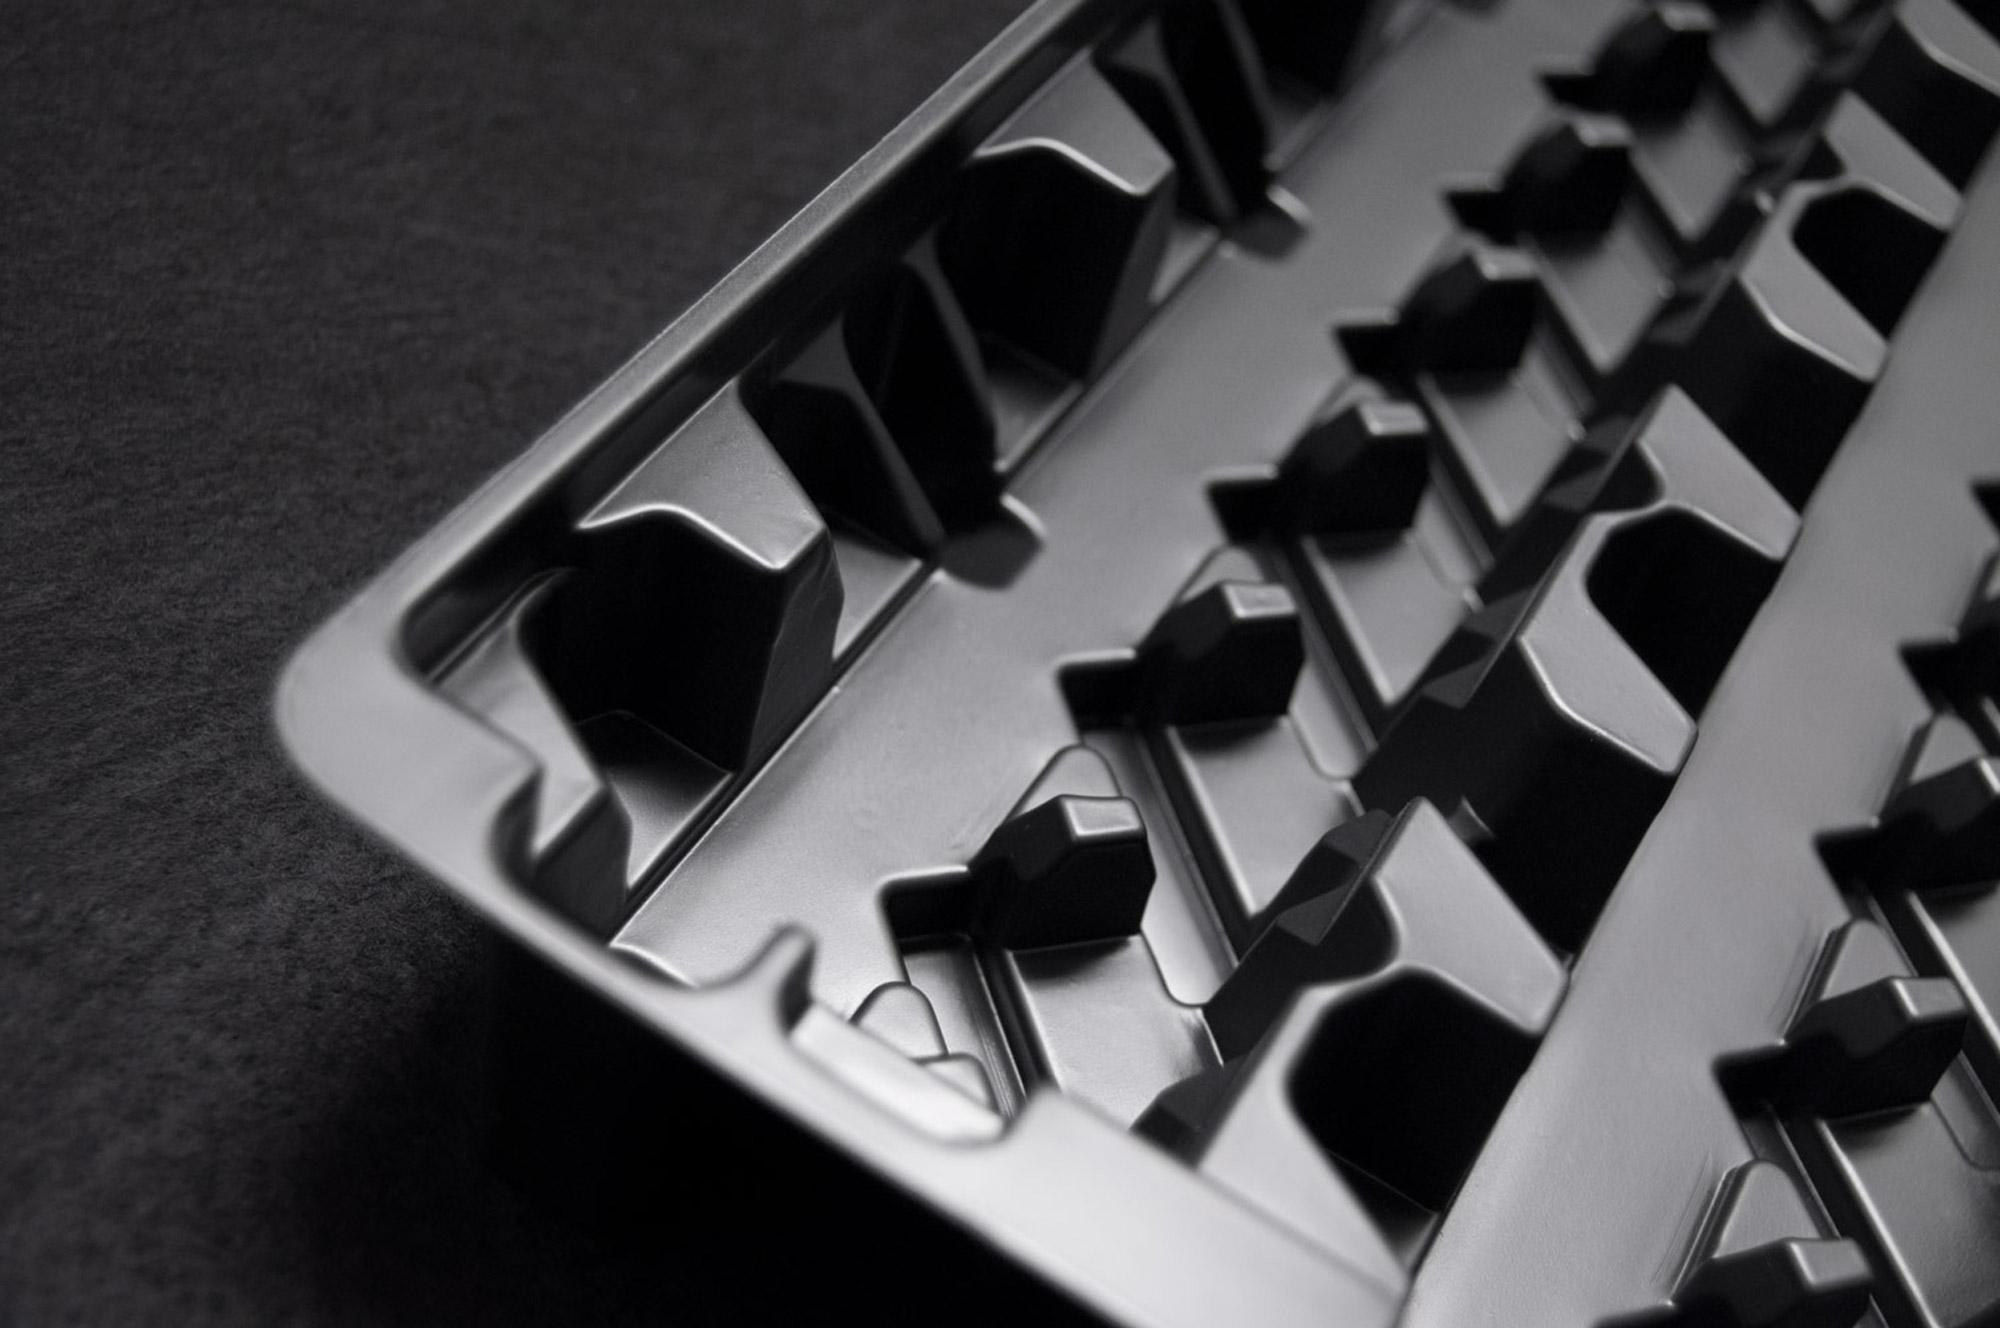 Creative Verpackungen photography by GPU Design